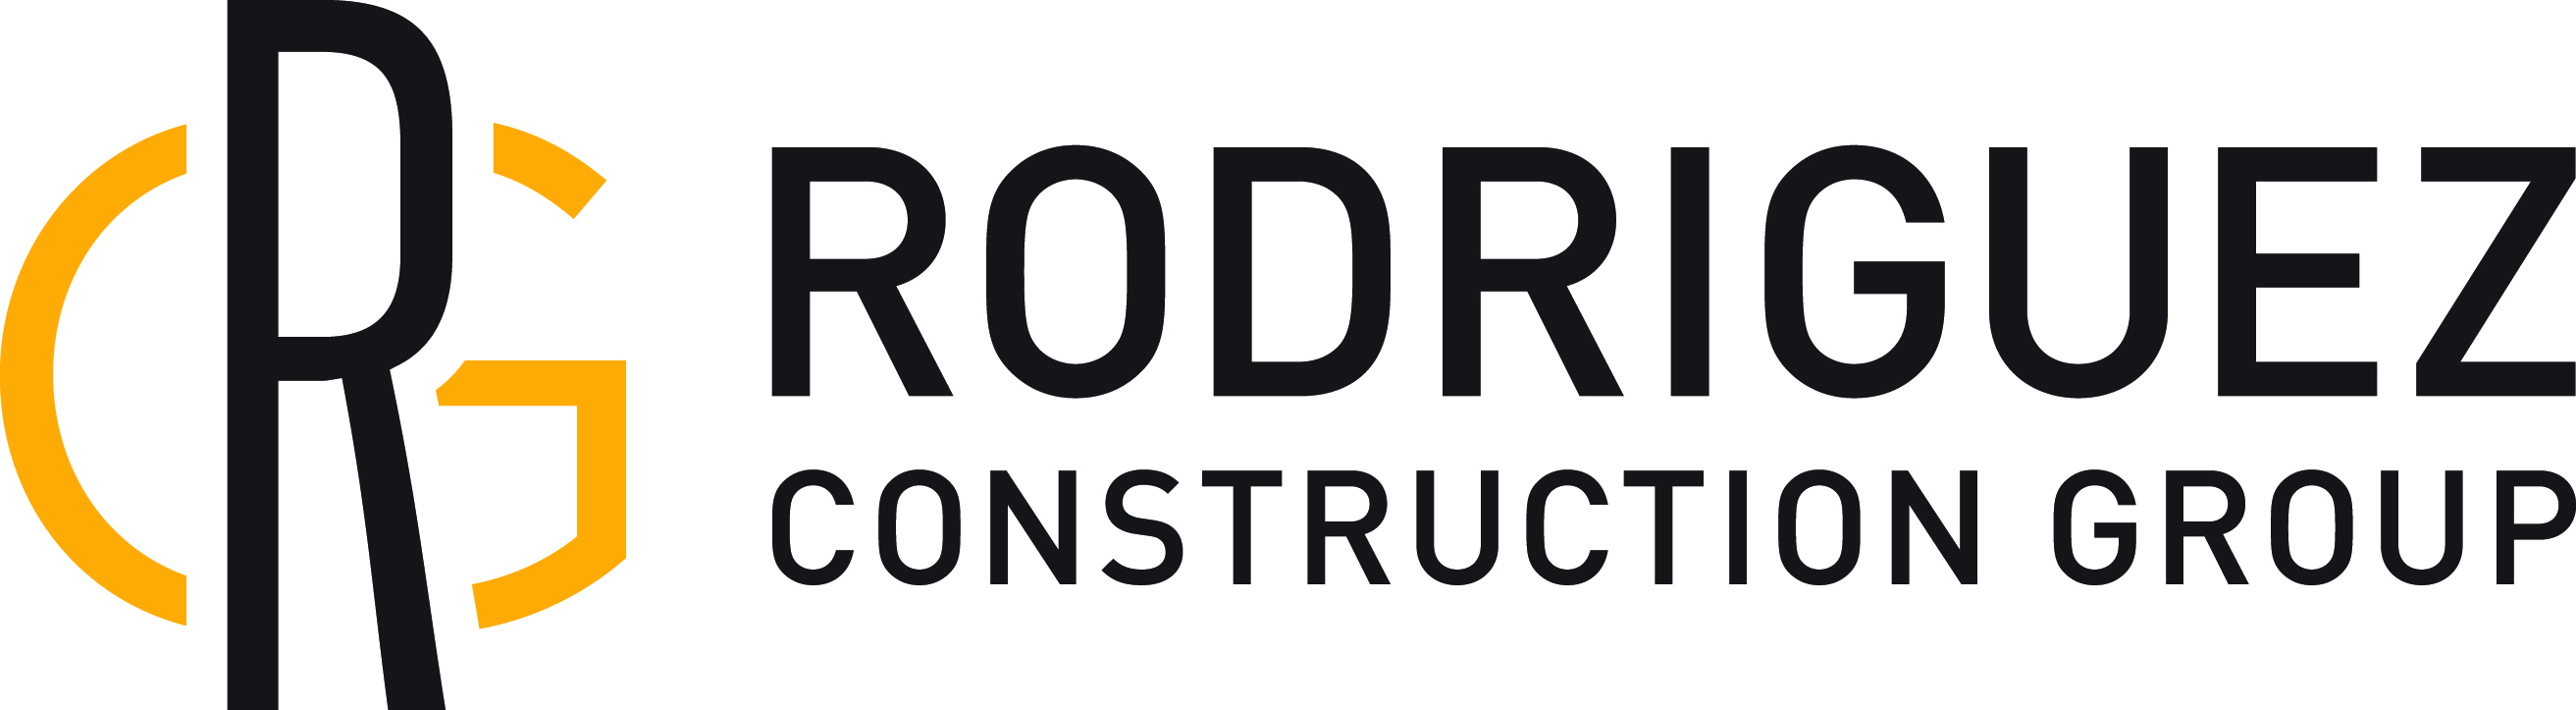 Rodriguez Construction